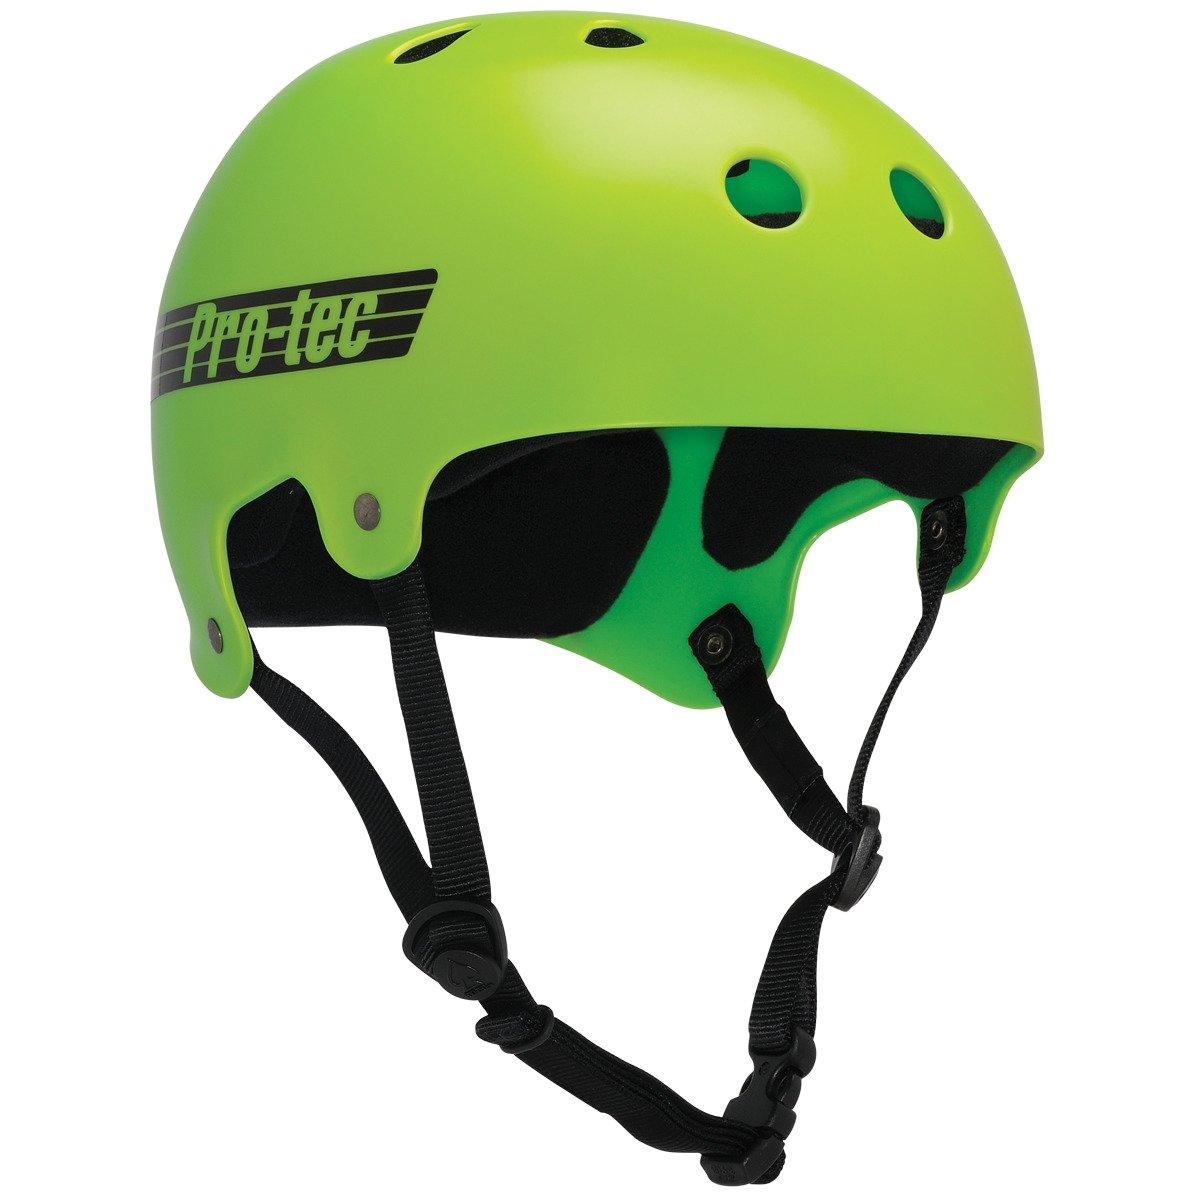 "ProTec Bucky Lasek Classic Bucky Yellow / Green Fade Skate Helmet - X-Large / 23.6"" - 24.4"""